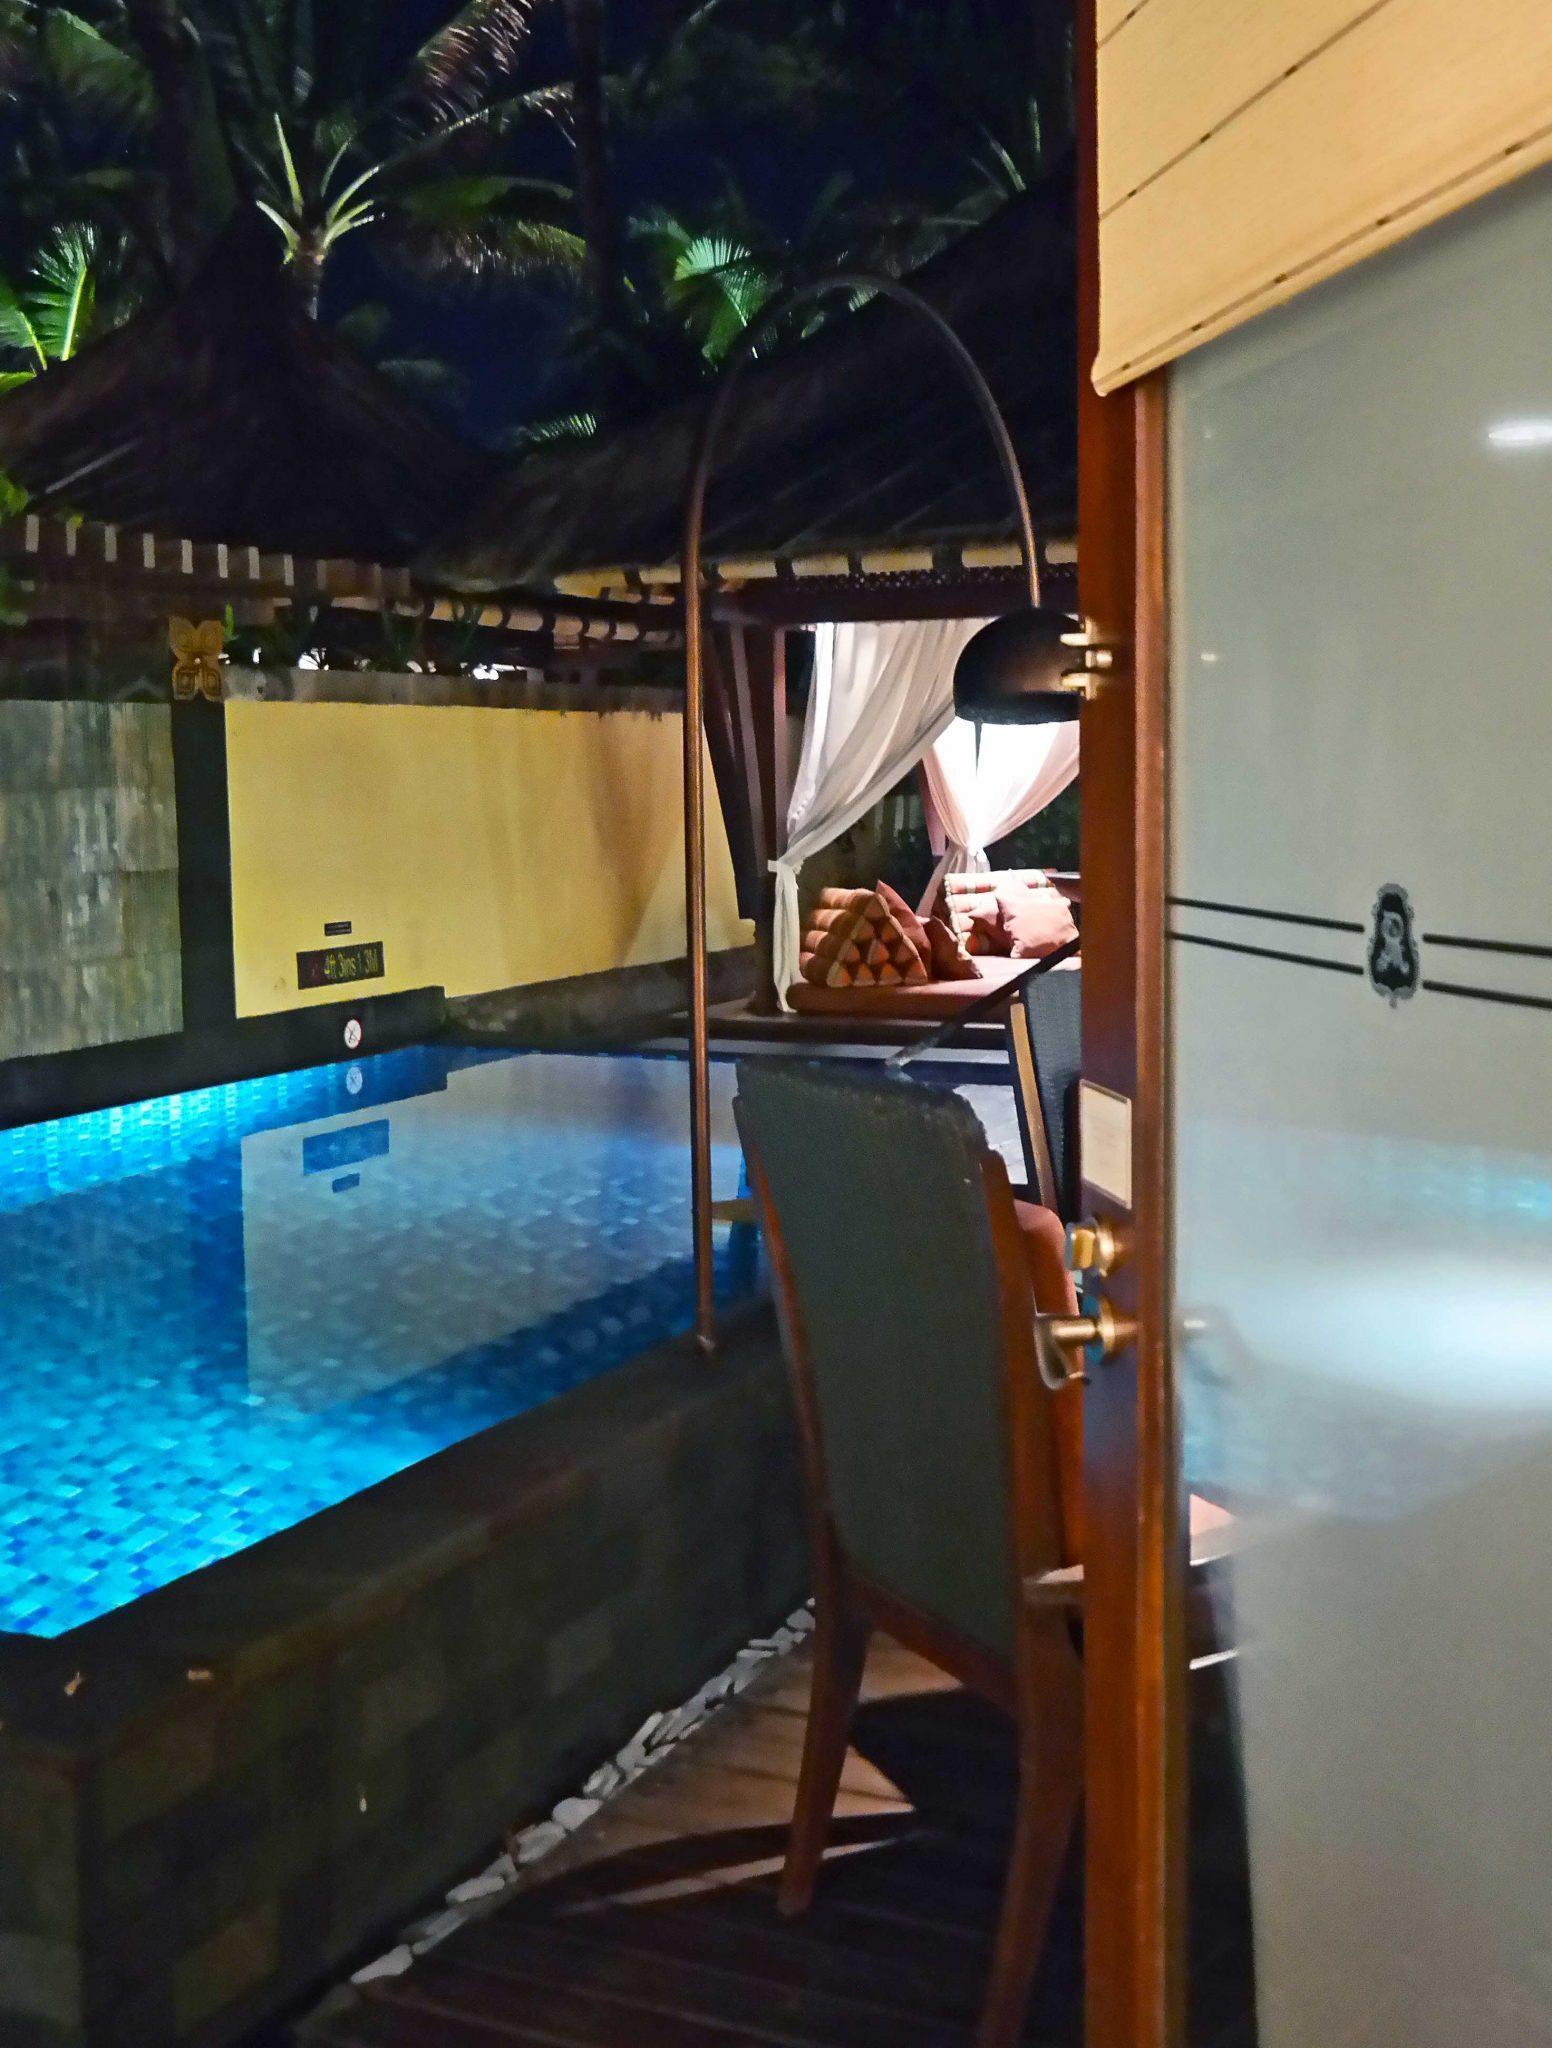 pool-at-night-time-st-regis-bali-resort